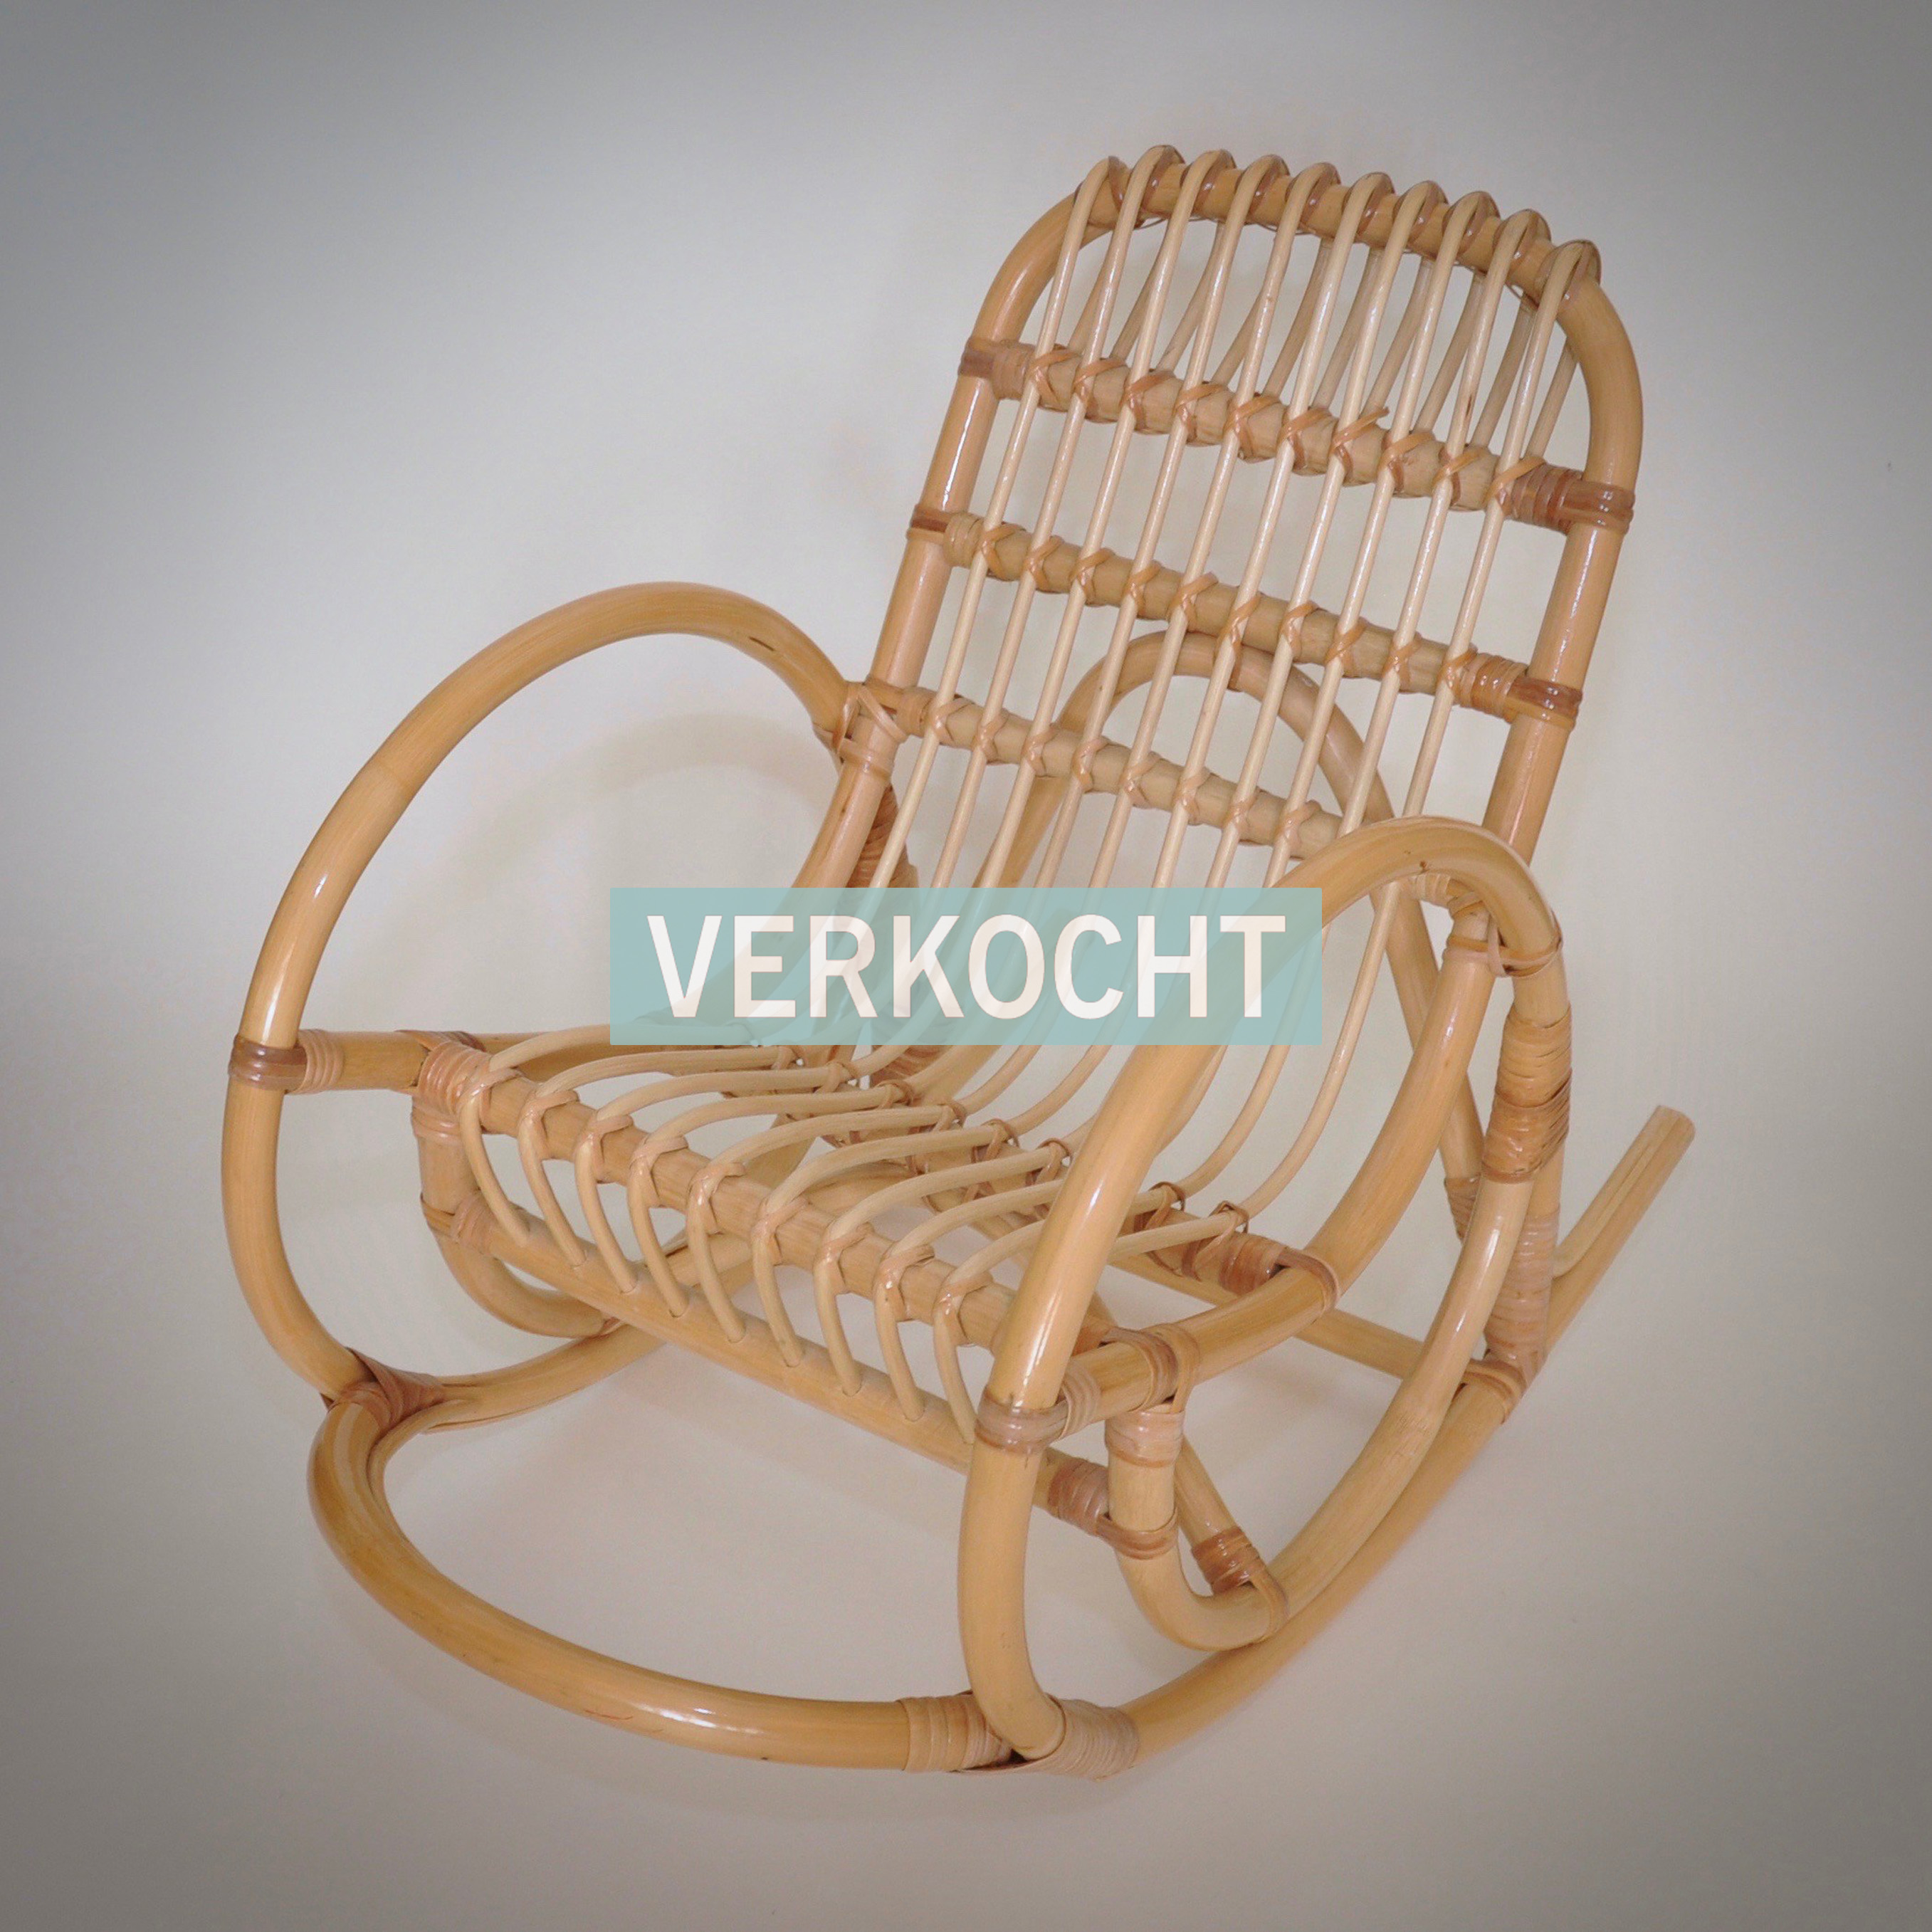 Retro Rotan Kinderstoeltje.Rotan Kinderstoel Ketsch Vintage Check Onze Webshop